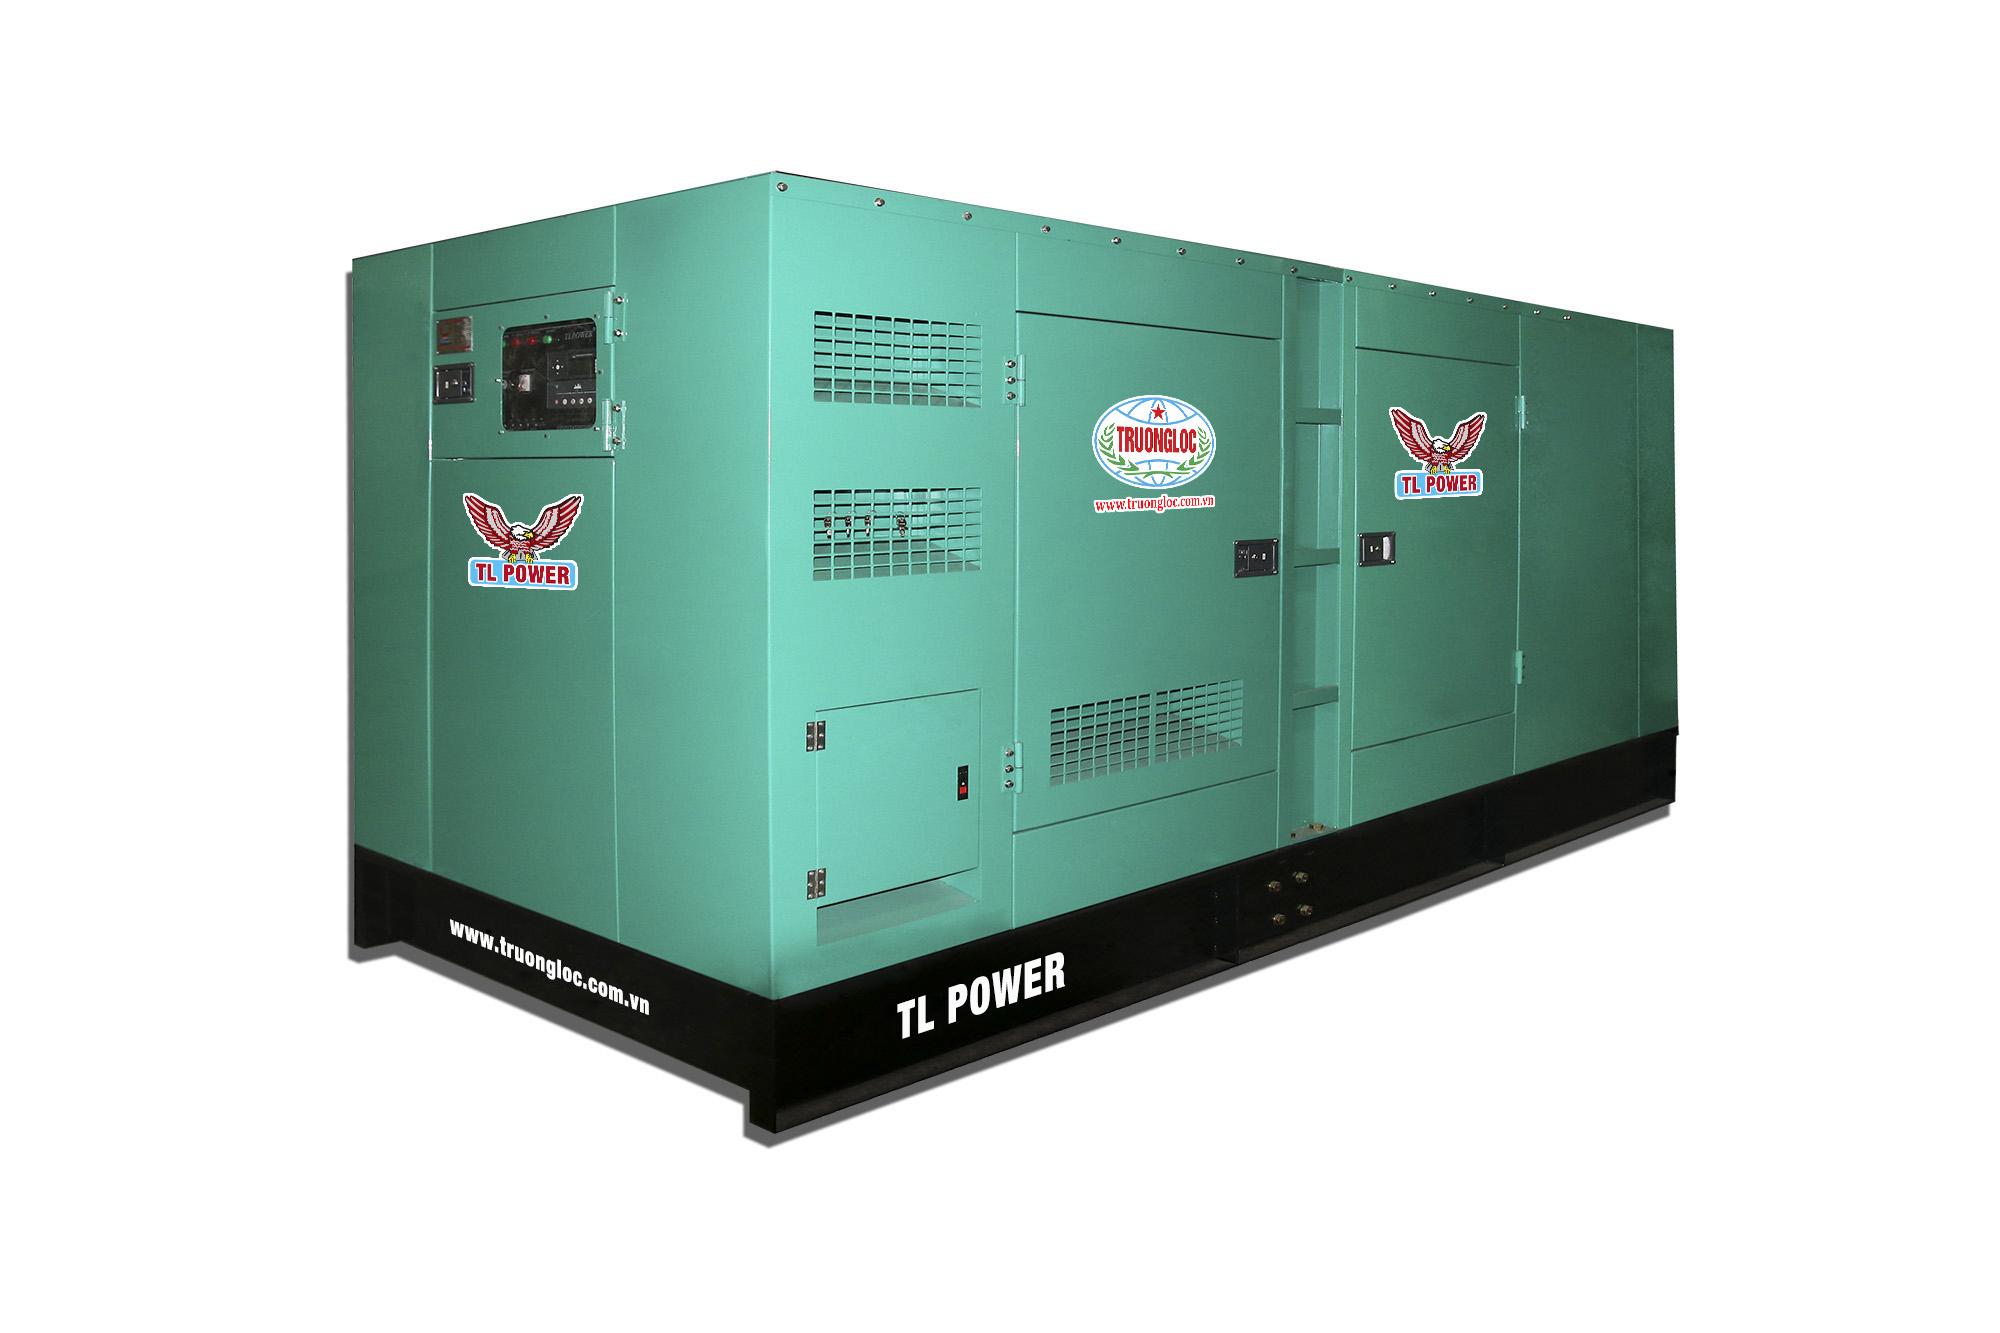 TLPOWER TP330-LS - PERKINS ENGINE